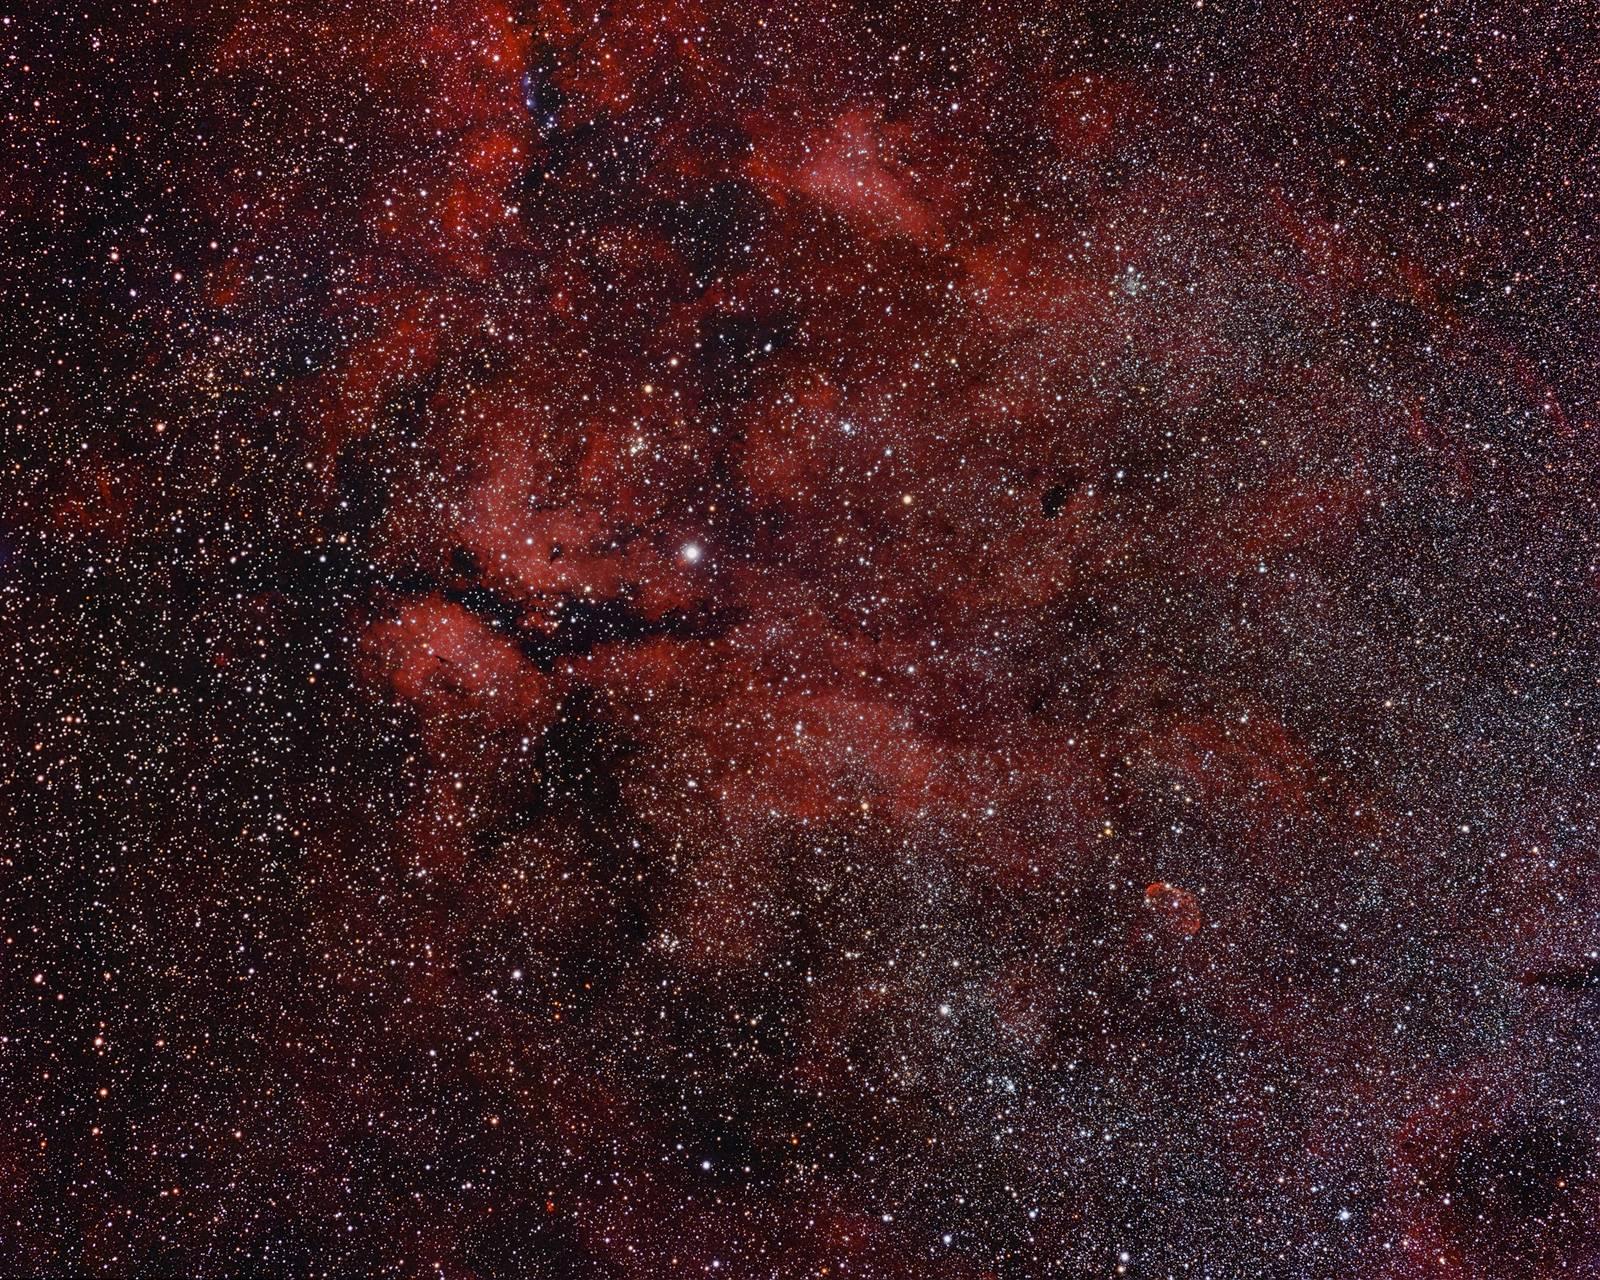 Gamma Cygnus